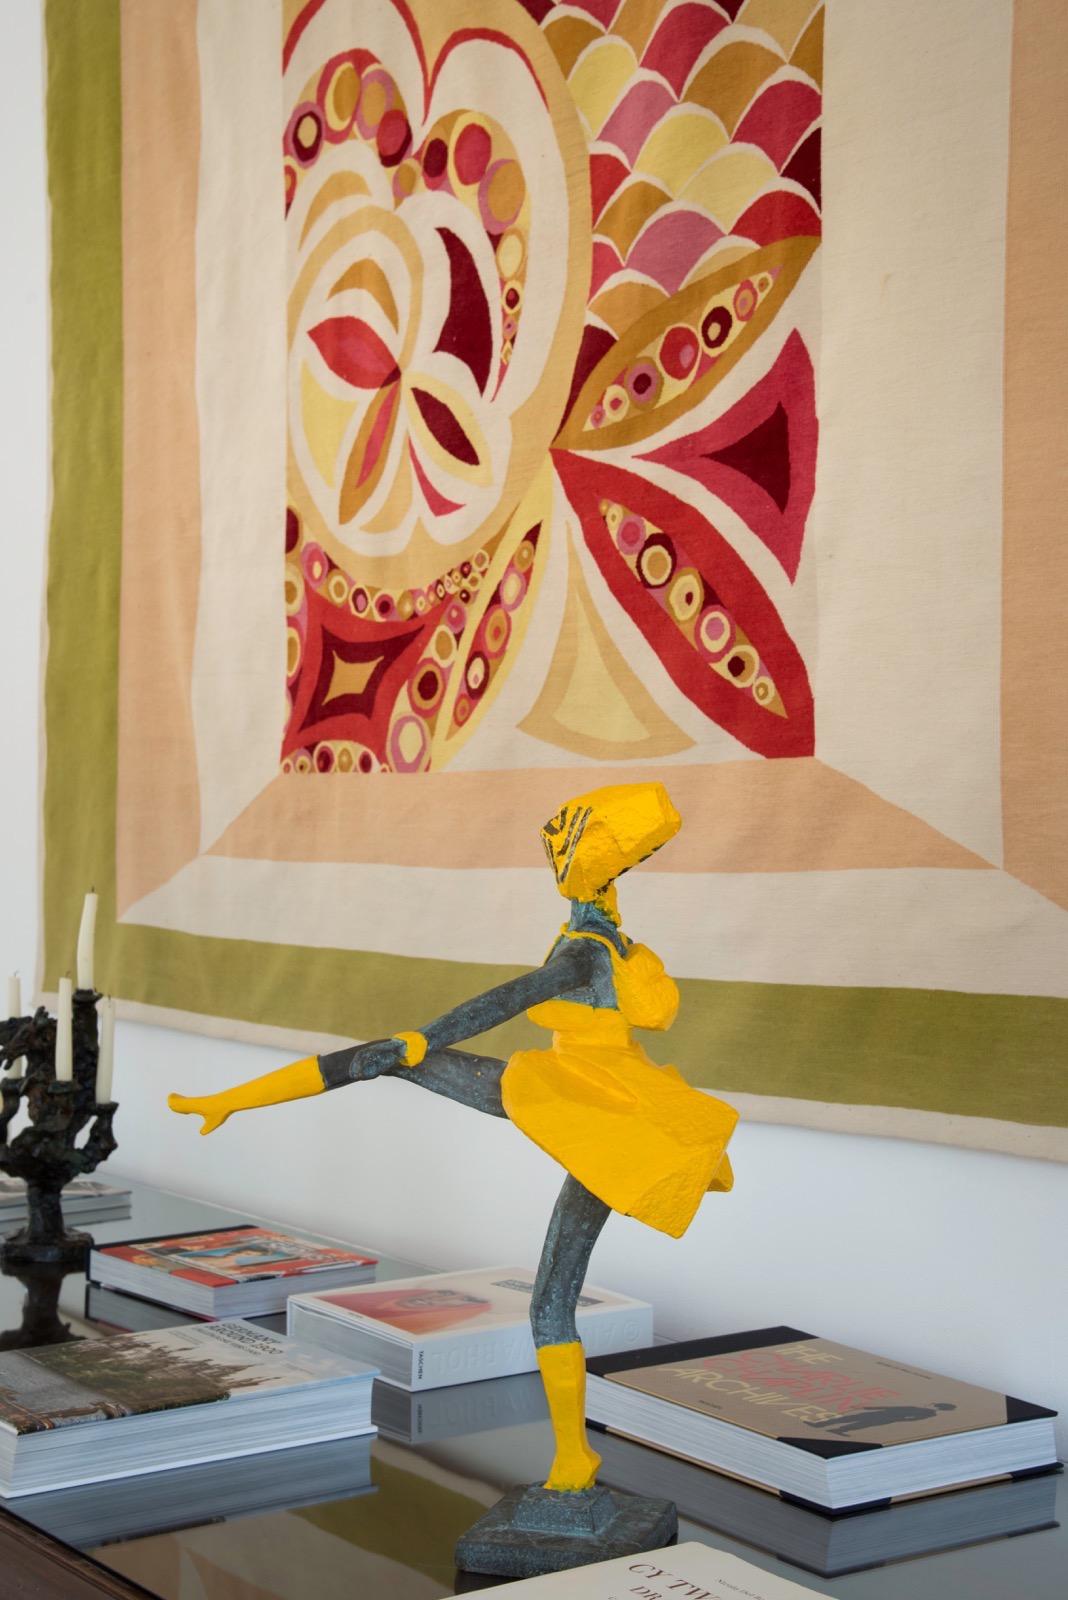 Ju Ming sculpture Francesco Vezzoli tapestry